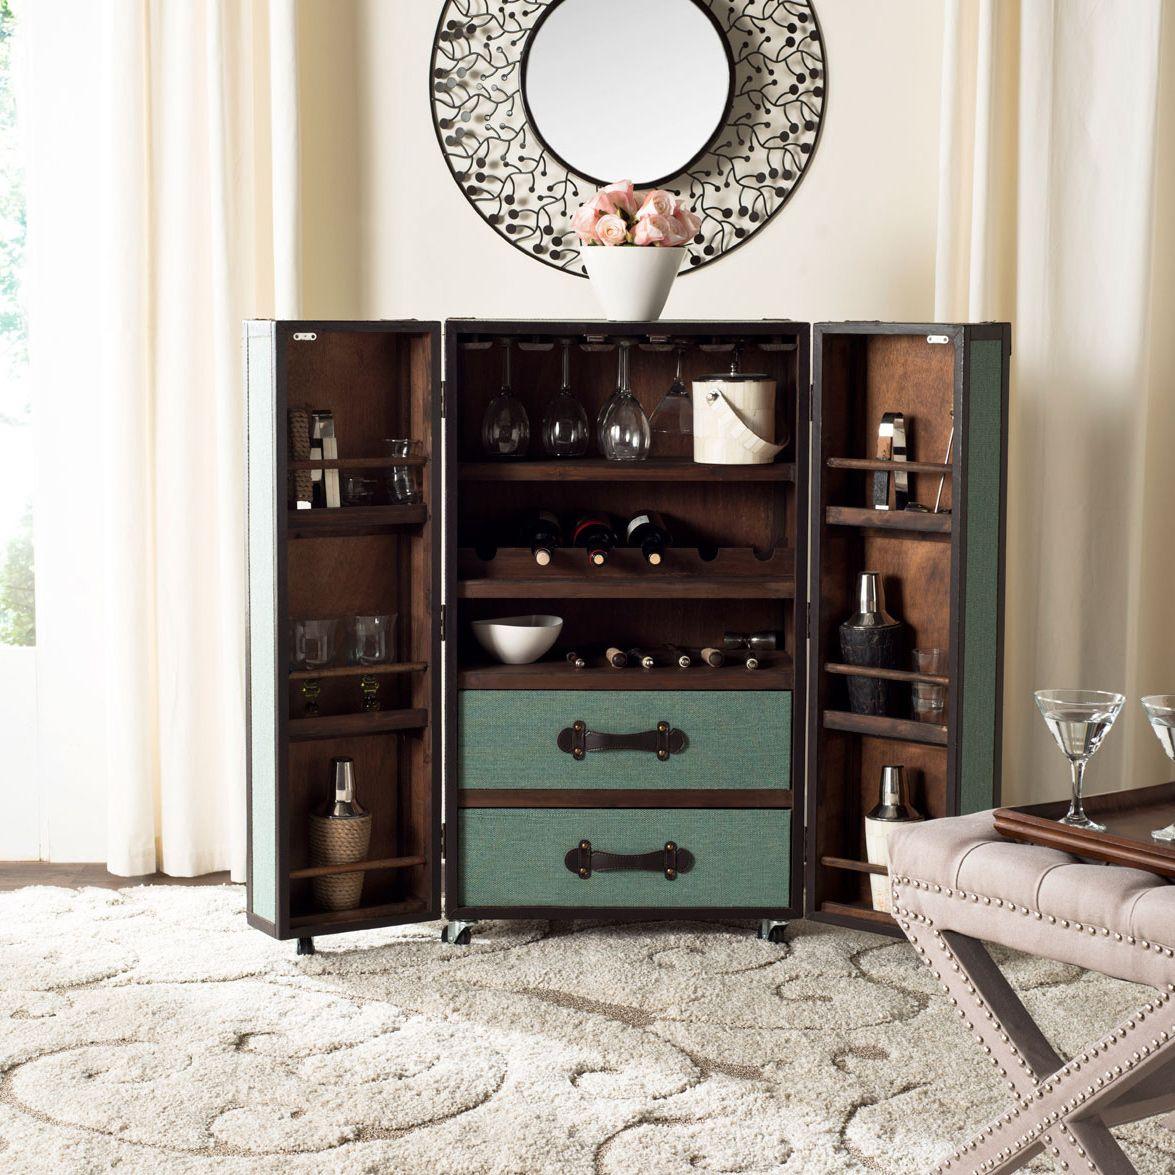 Steamer Trunk Bar Cabinet in Sage - Dot & Bo | DIY - Furniture ...